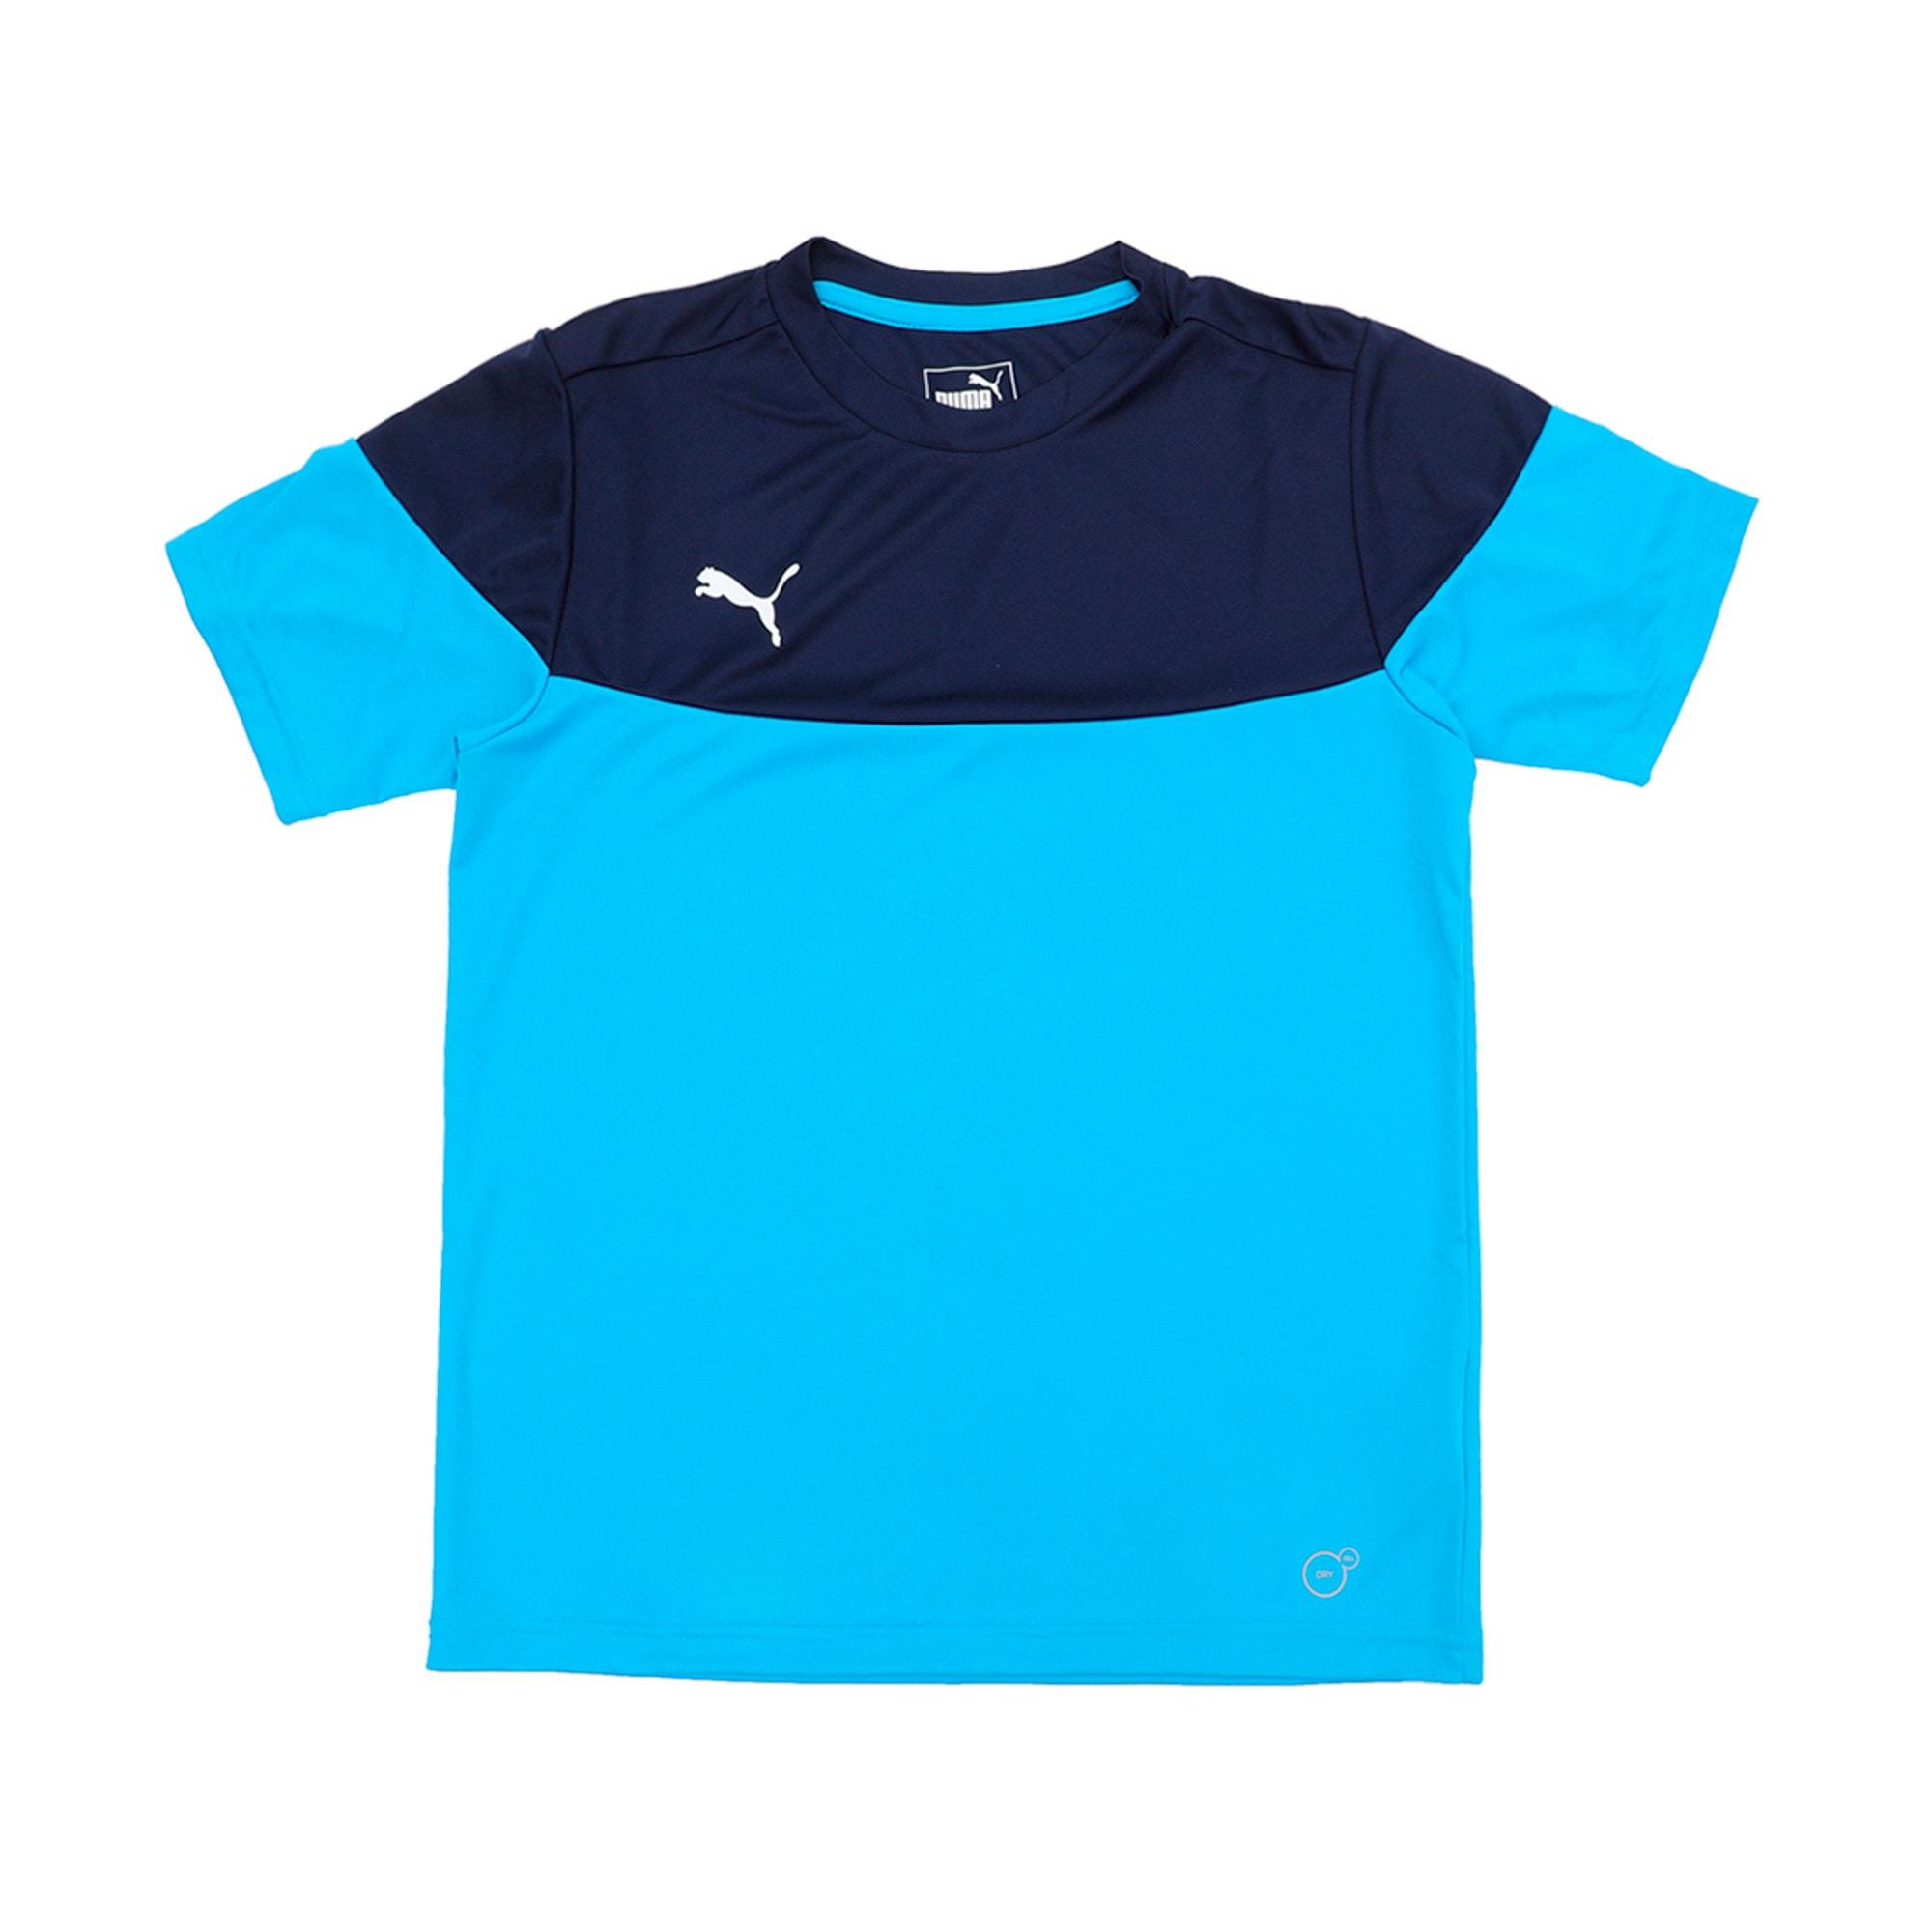 Thumbnail 1 of ftblPLAY Kids' Shirt, Bleu Azur-Peacoat, medium-IND